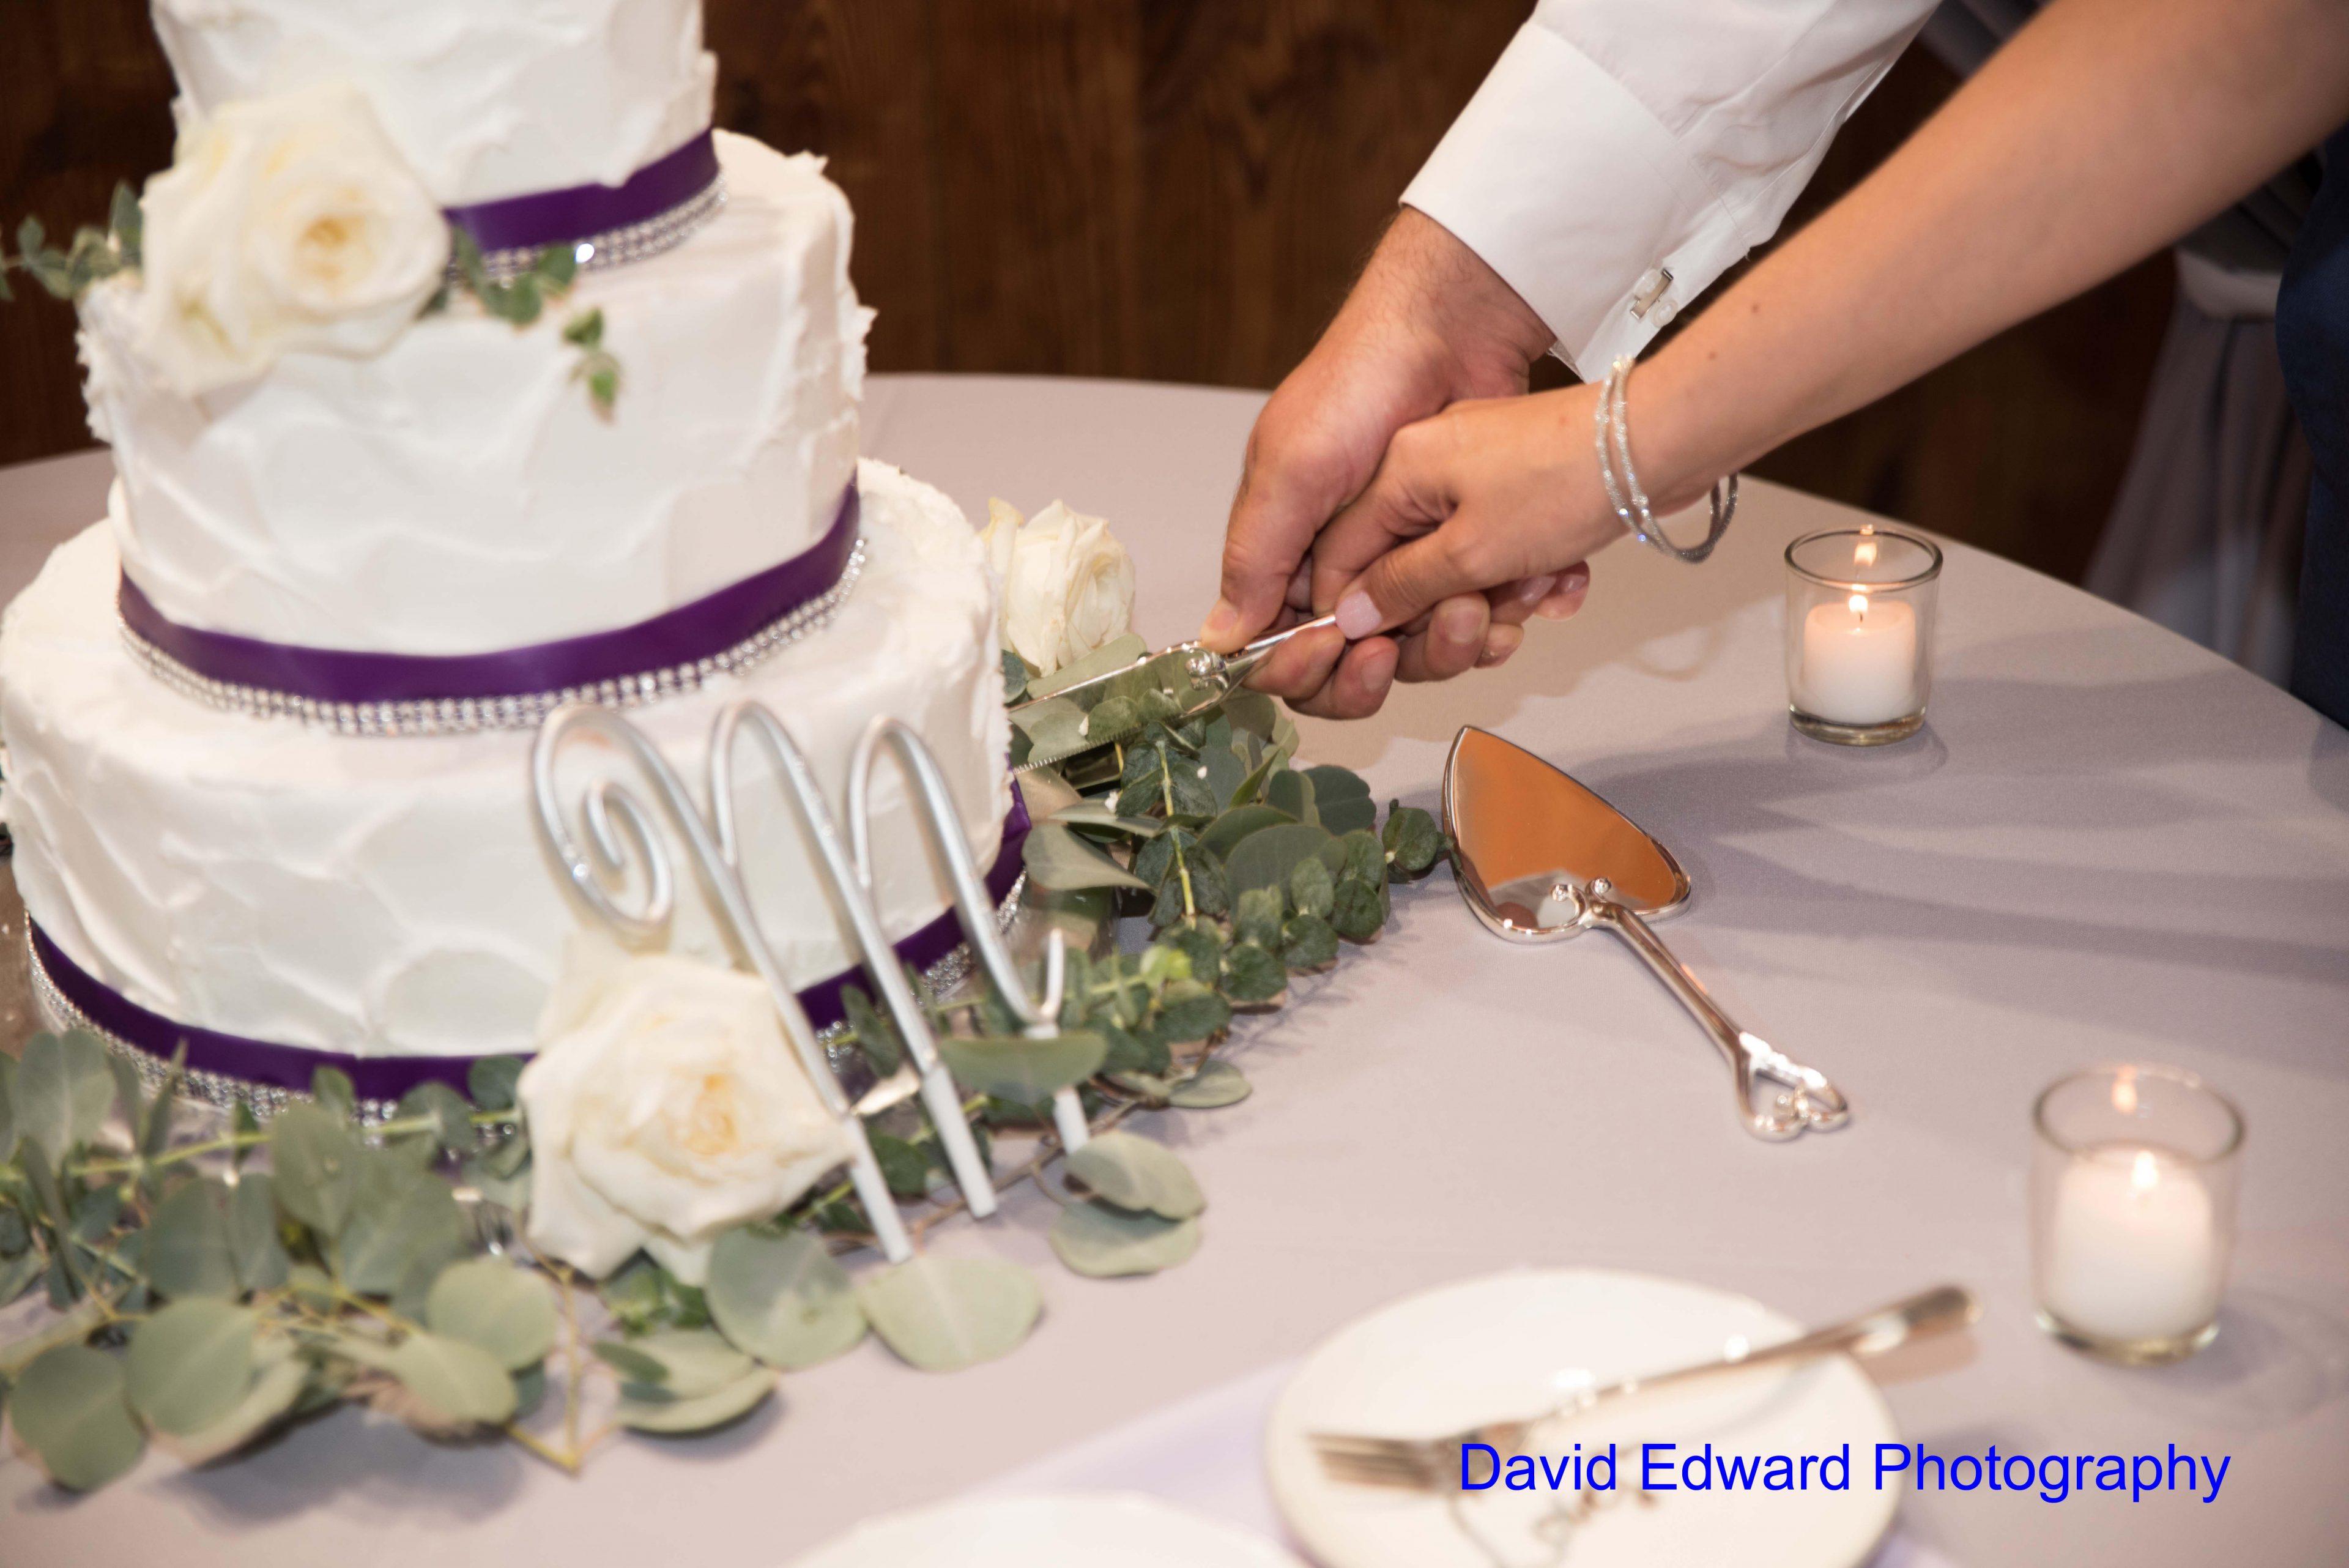 Magnificent Moments Weddings Dairy Barn David Edward Photography(17) Min